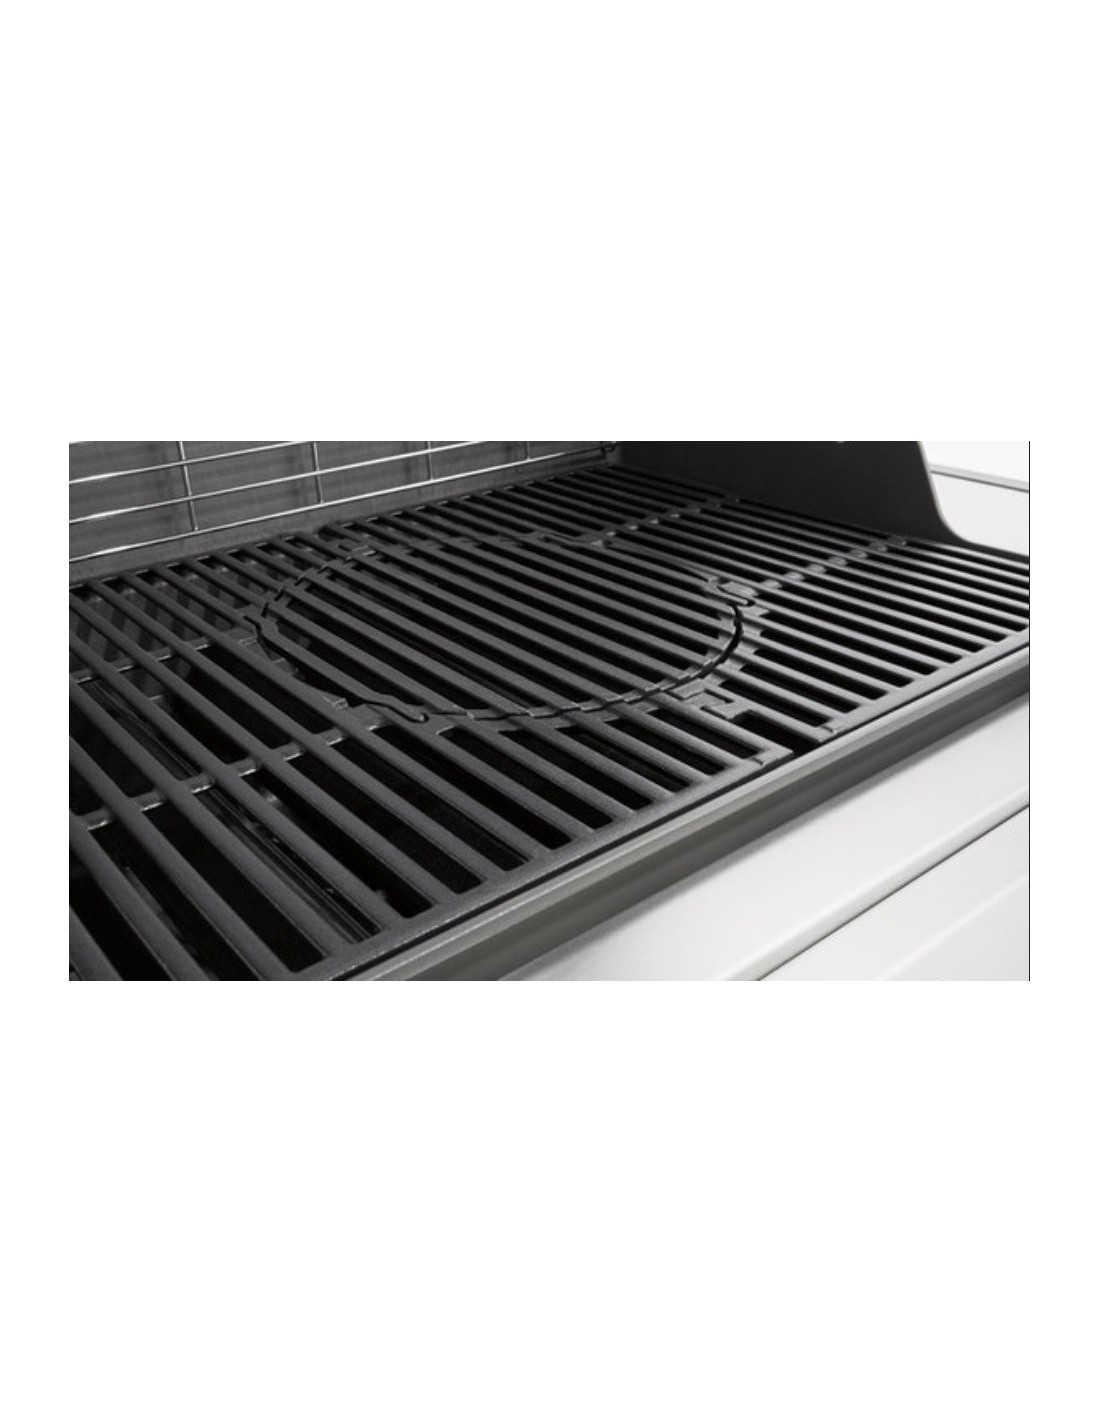 Barbecue à gaz Genesis II LX S-640 Gbs inox + plancha ...